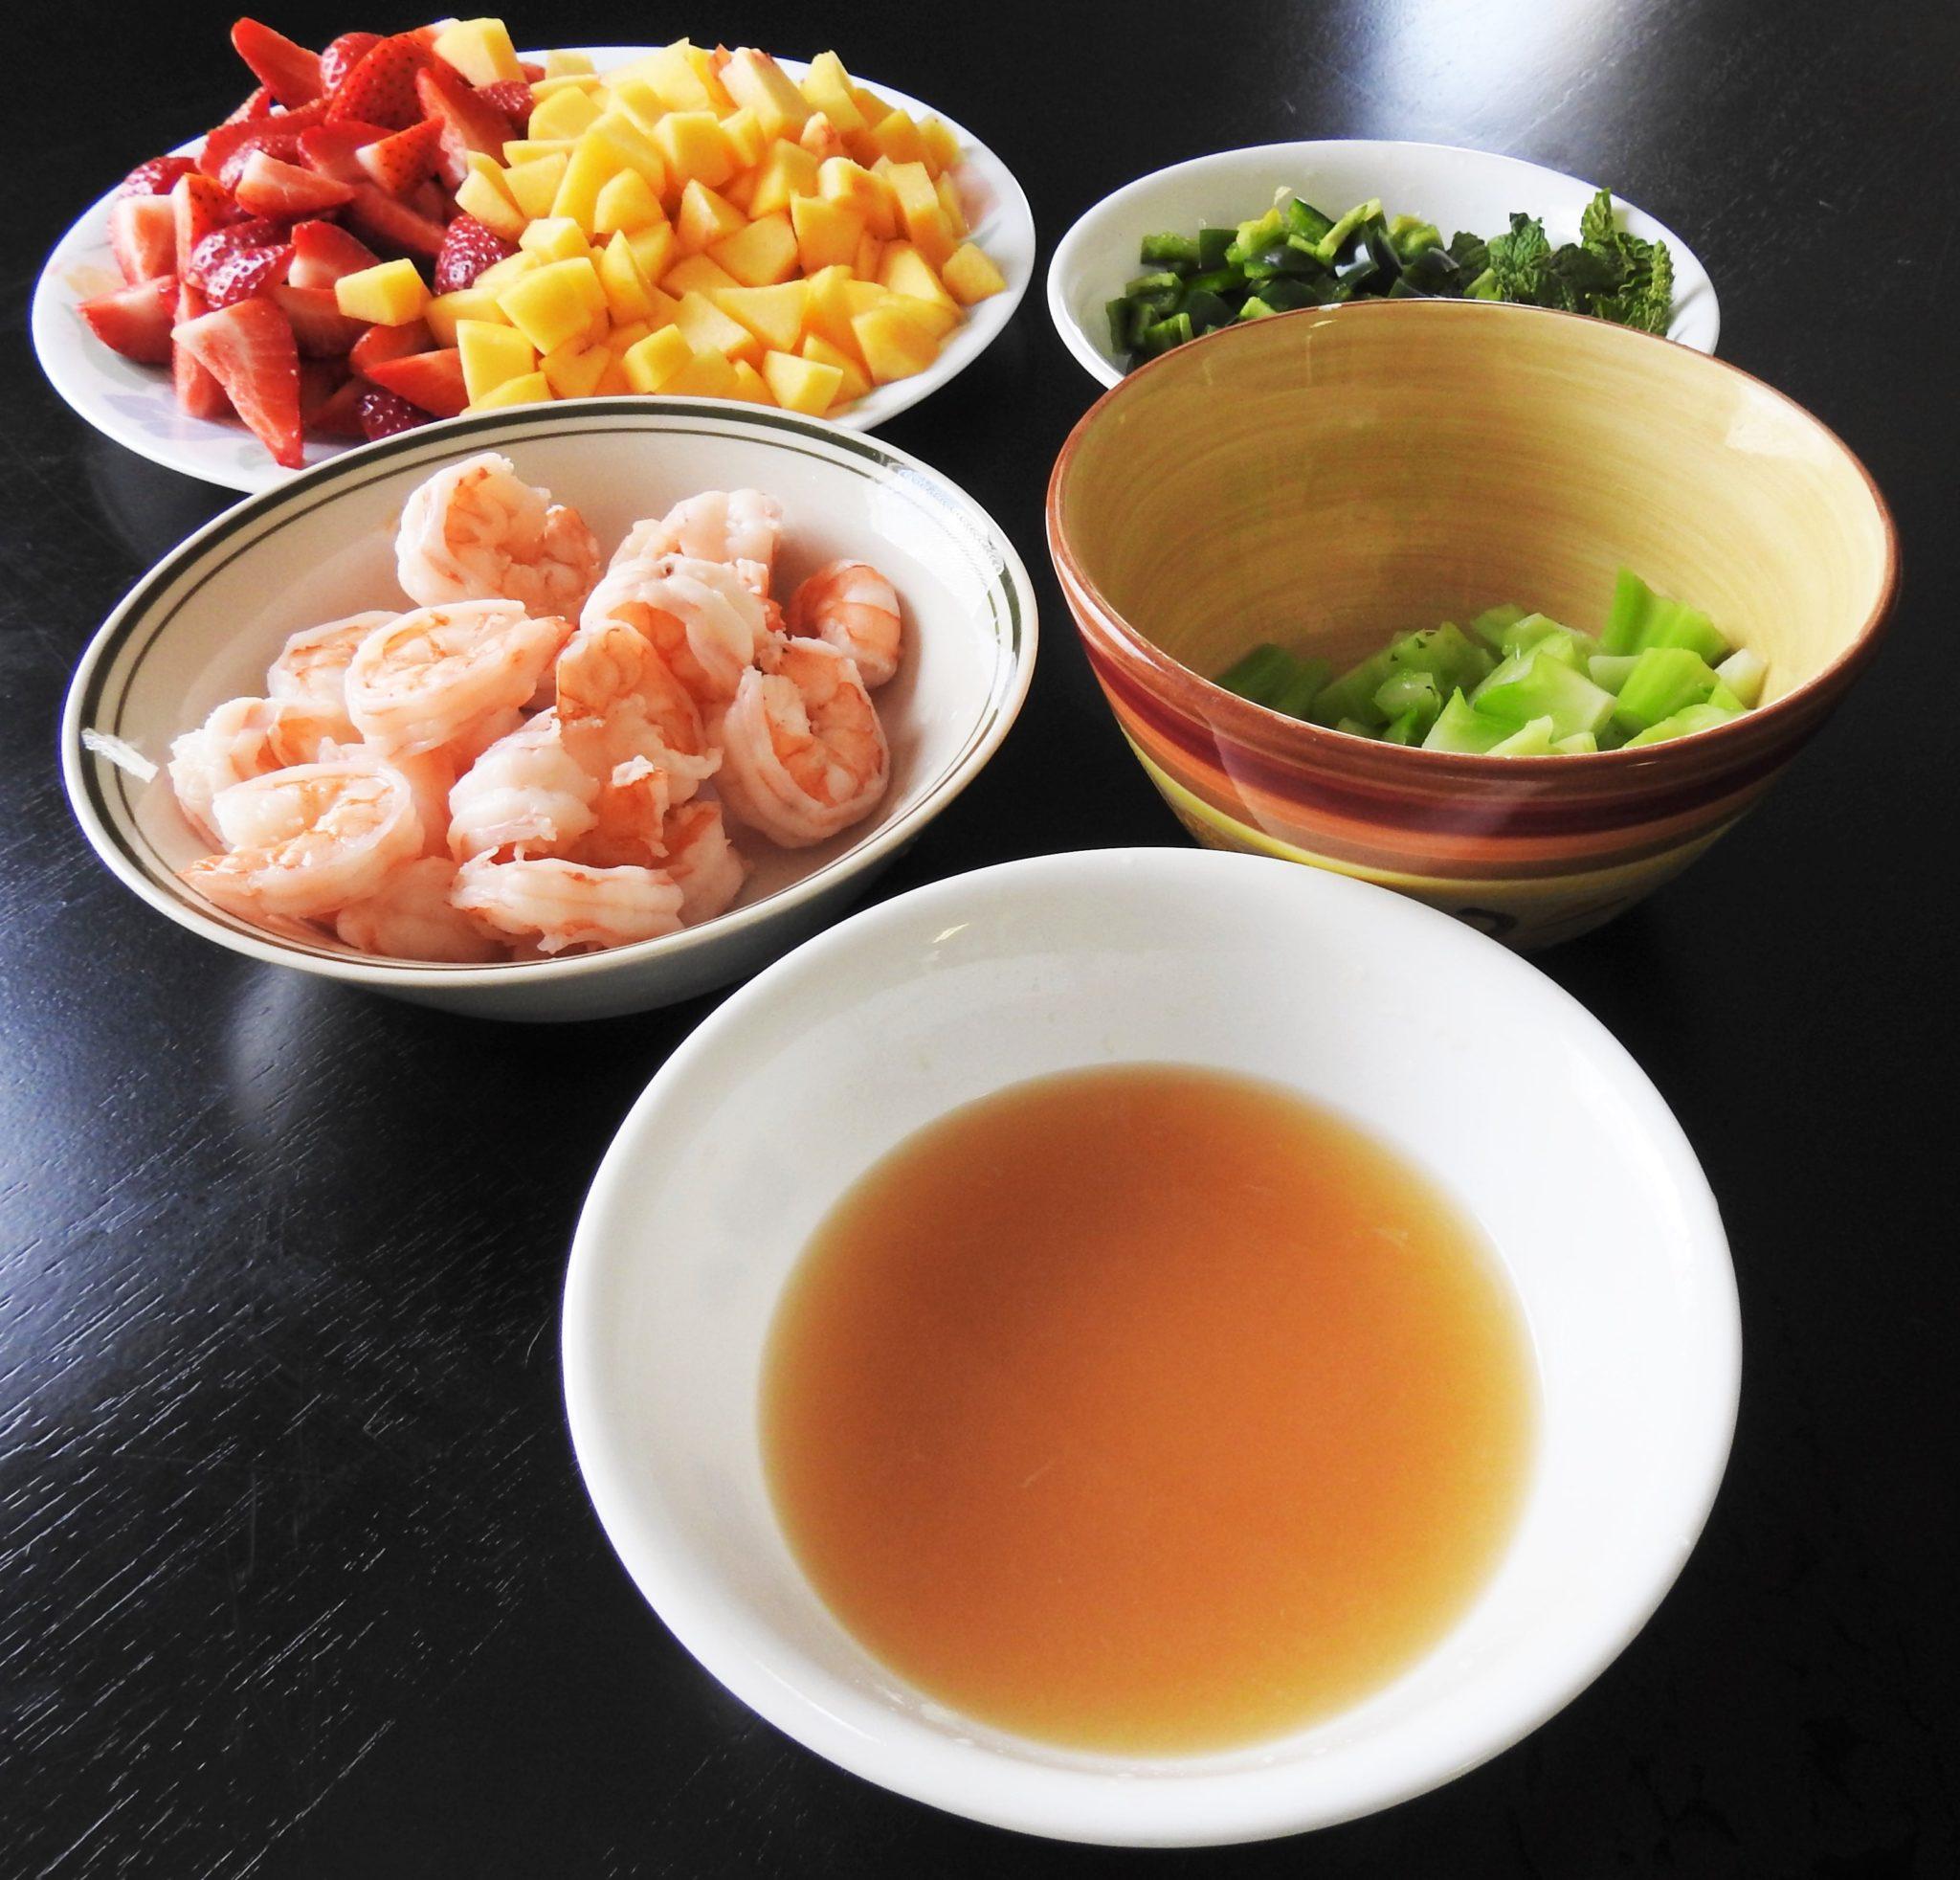 Strawberry Peach Shrimp Thai Salad Ingredients